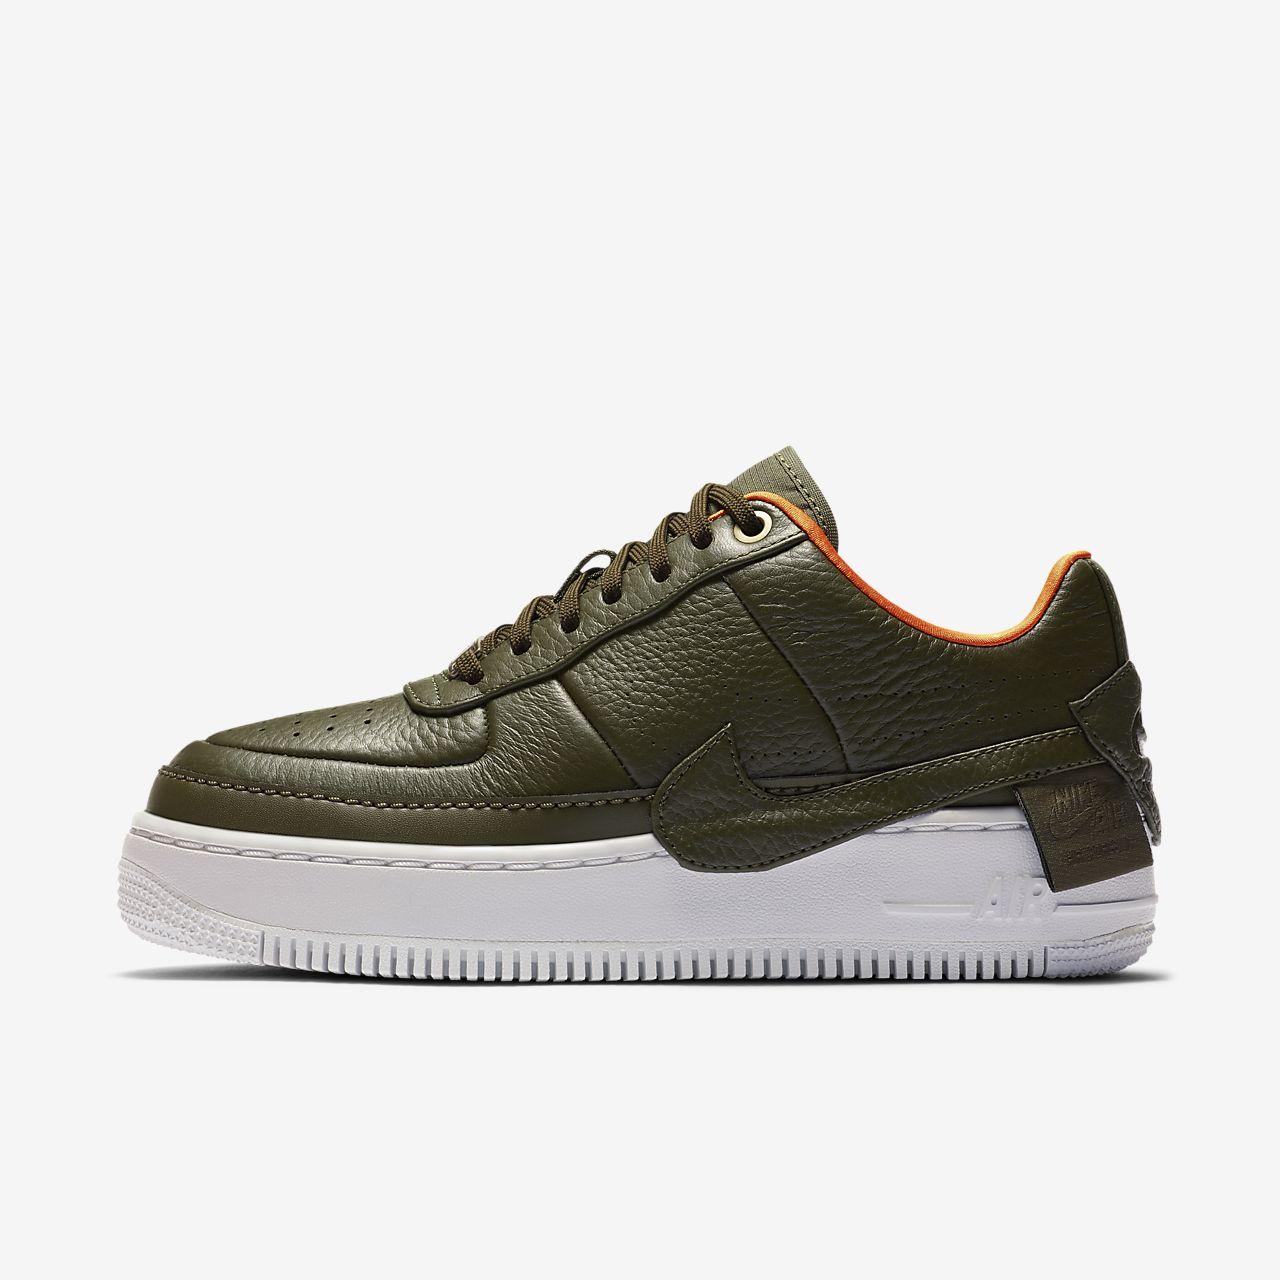 premium selection 0be3e 809e7 Sko för kvinnor Nike Air Force 1 Jester XX Premium